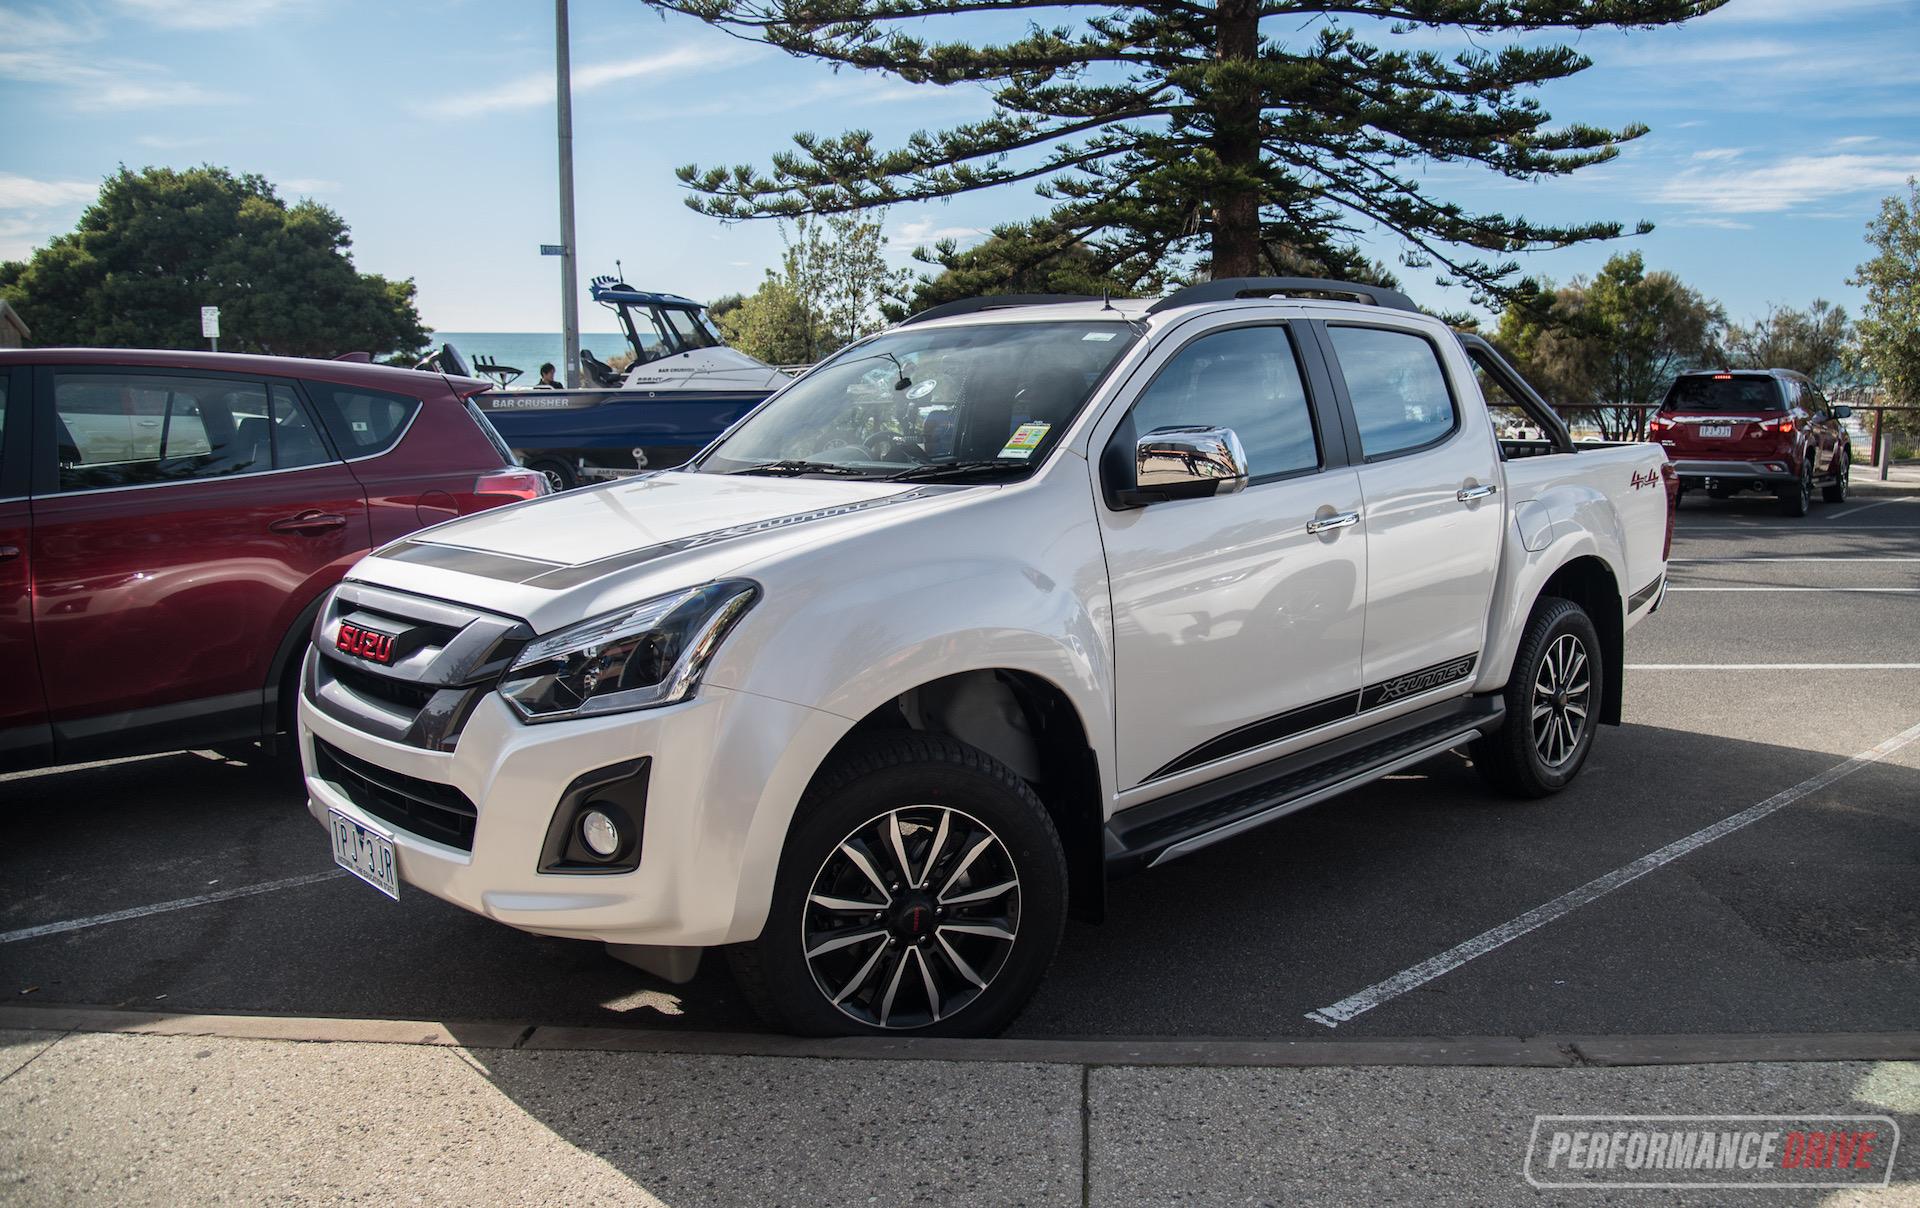 2019 Isuzu D-Max & MU-X review - Australian launch ...